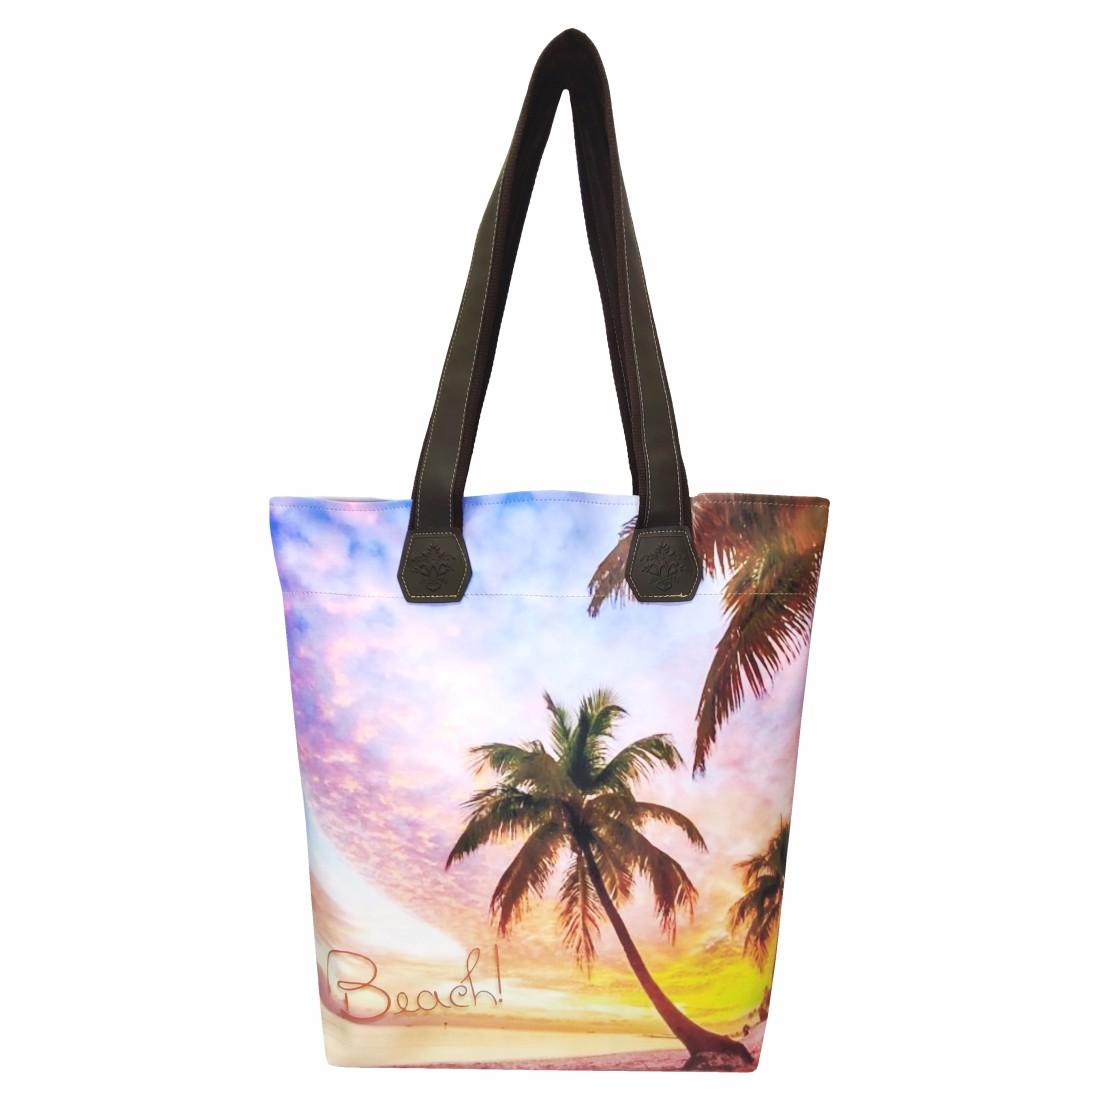 Kit Praia Feminino Beach, Bolsa, Necessaire e Chinelo, Magicc